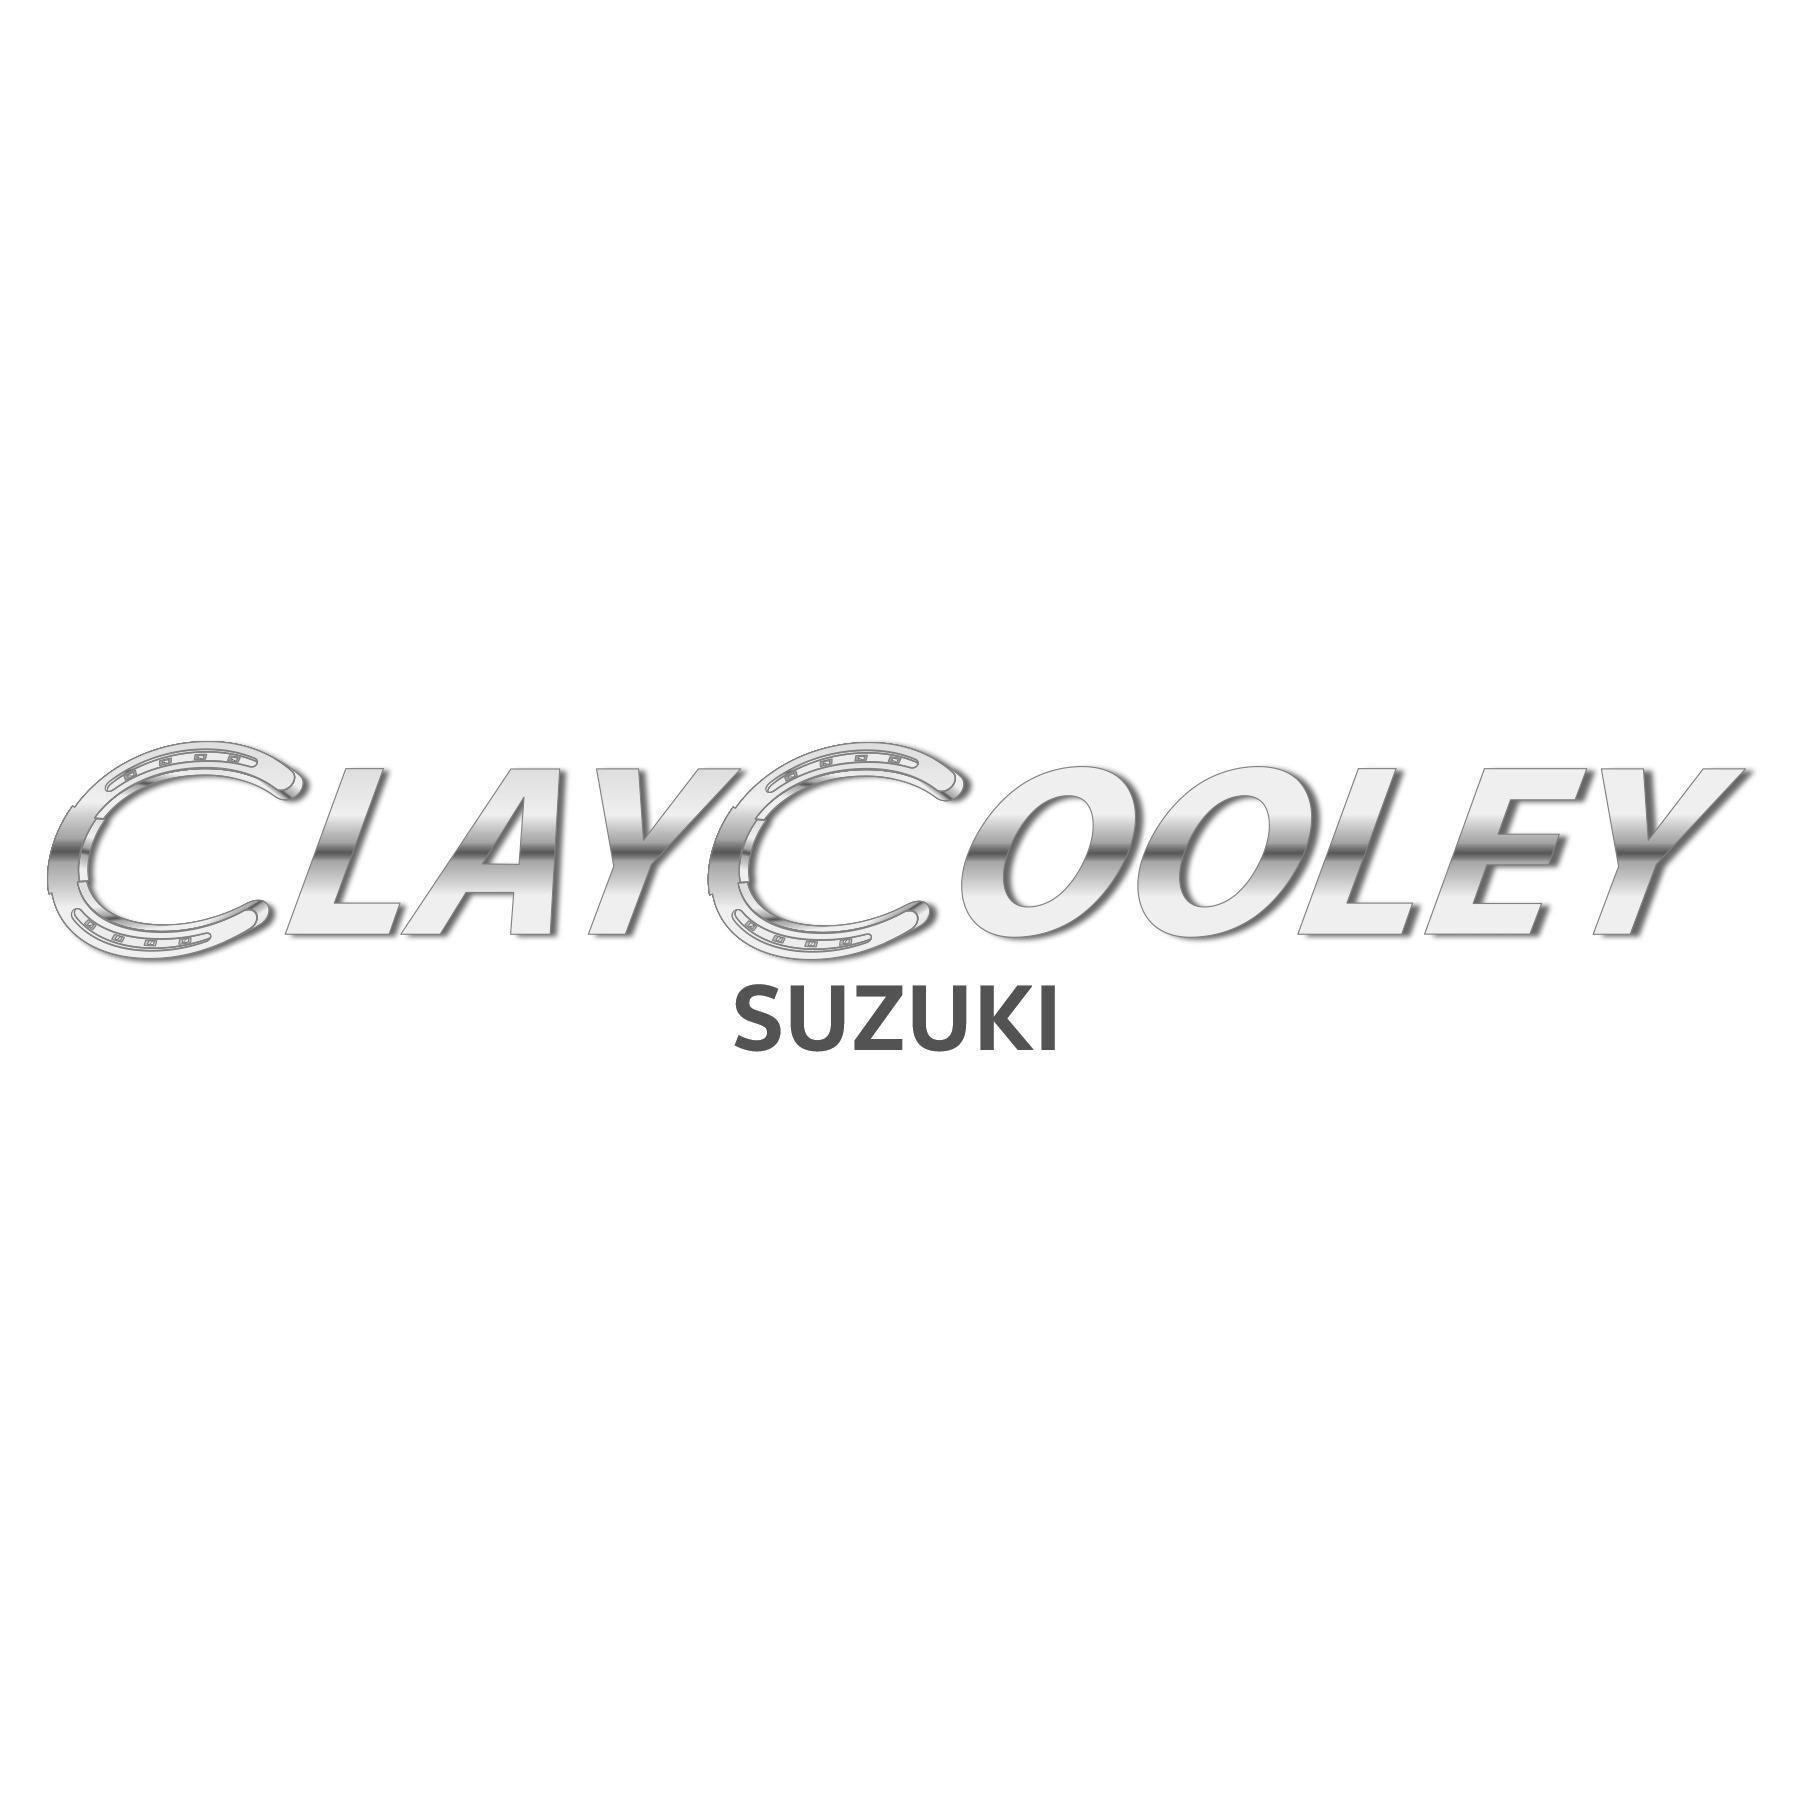 Clay Cooley Dallas >> Clay Cooley Suzuki 10849 Composite Dr Dallas Tx Auto